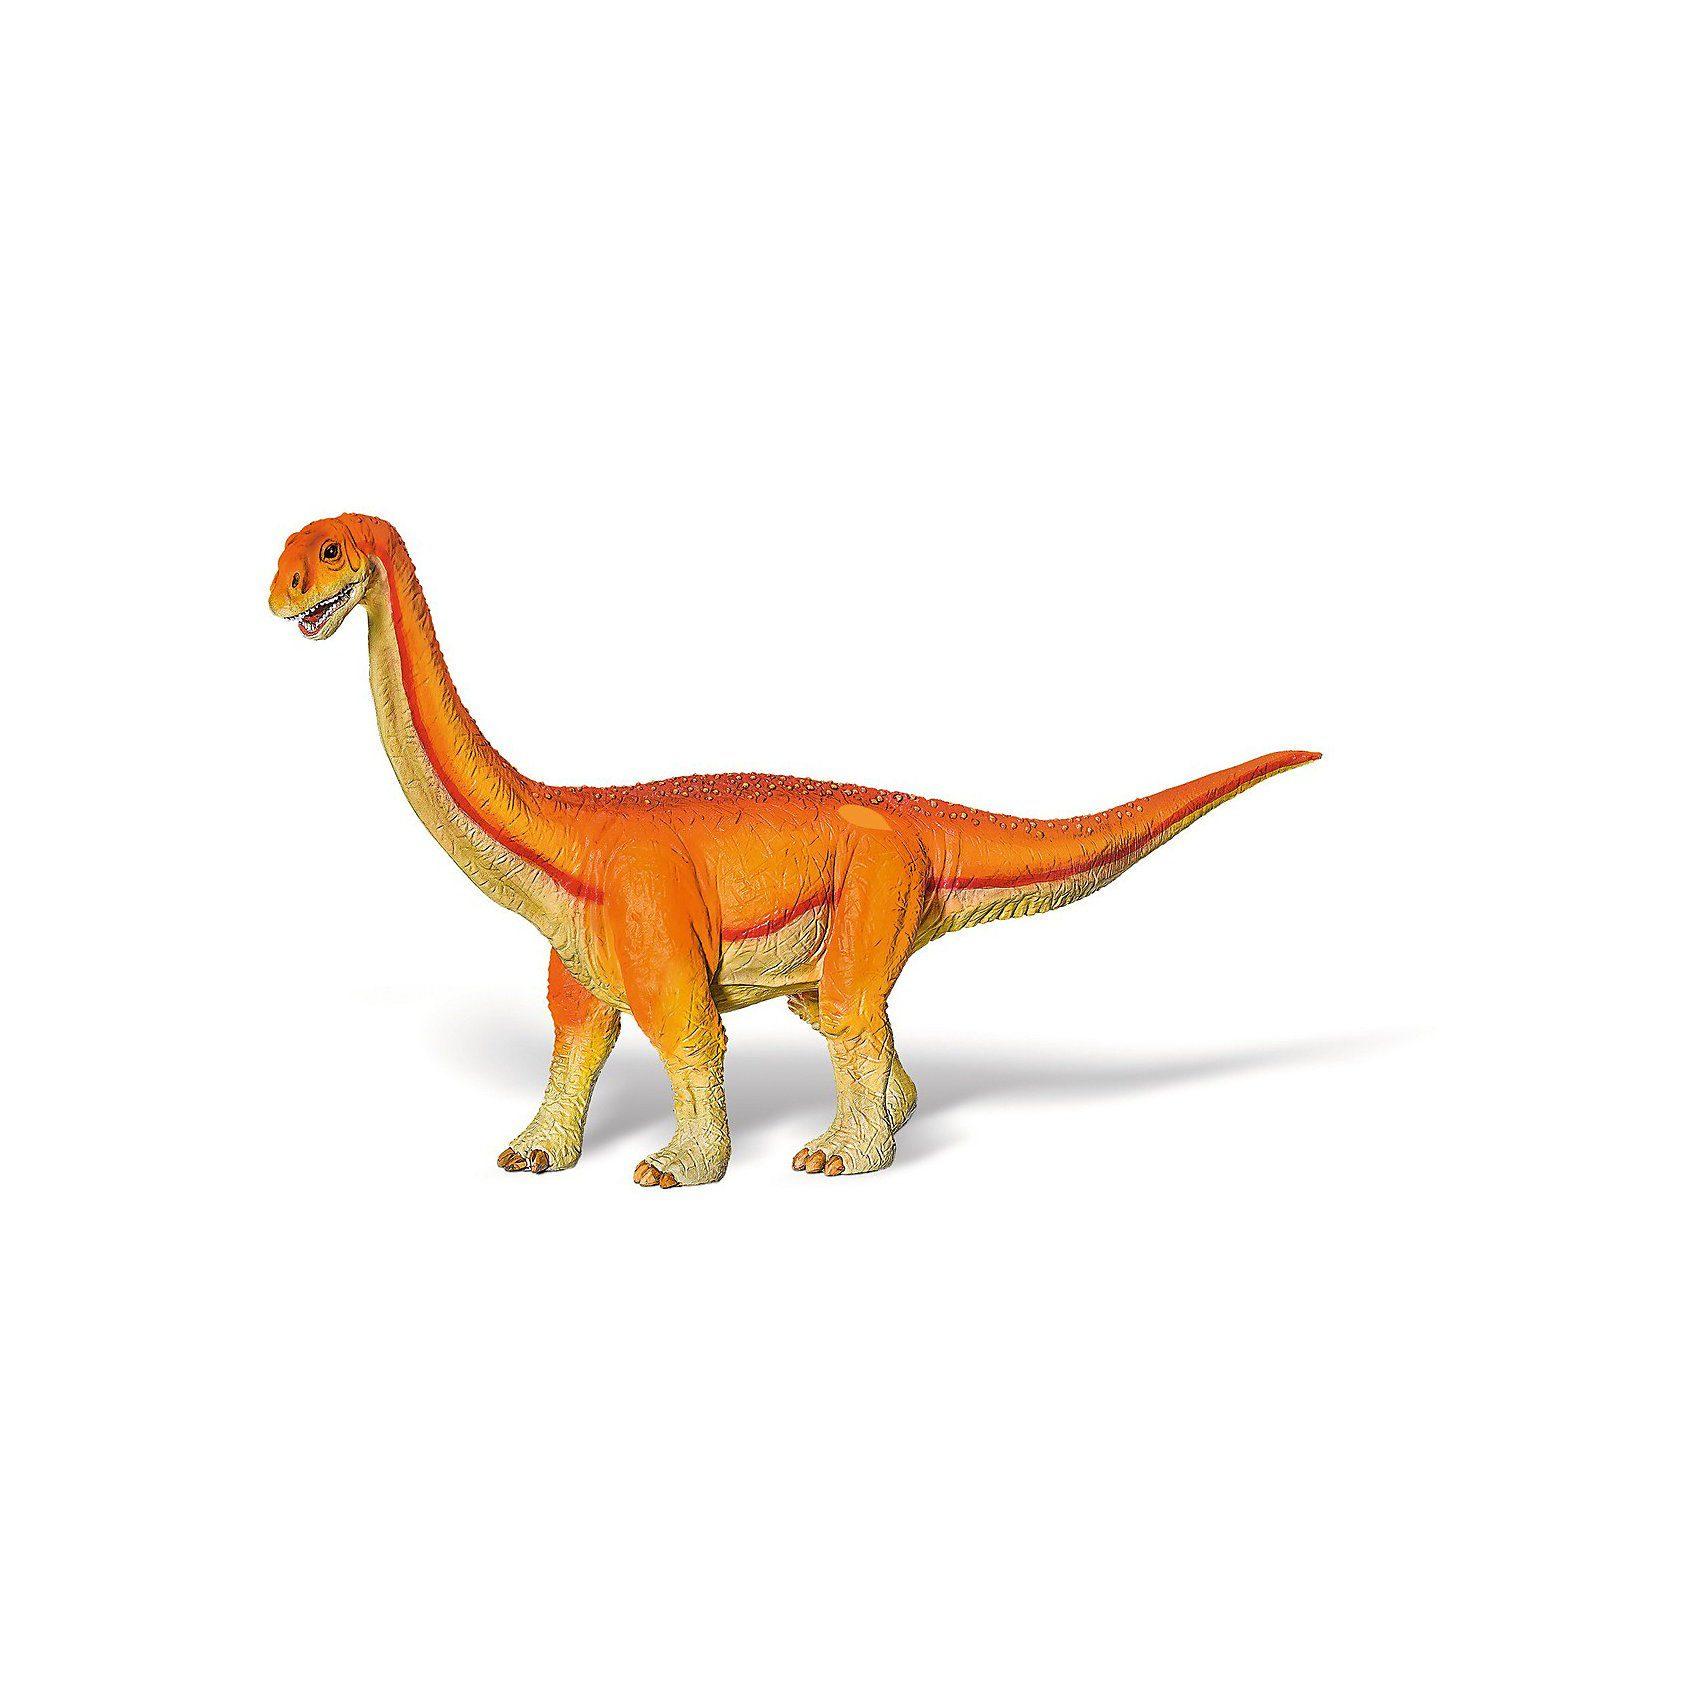 Ravensburger tiptoi® Dinosaurier Camarasaurus klein